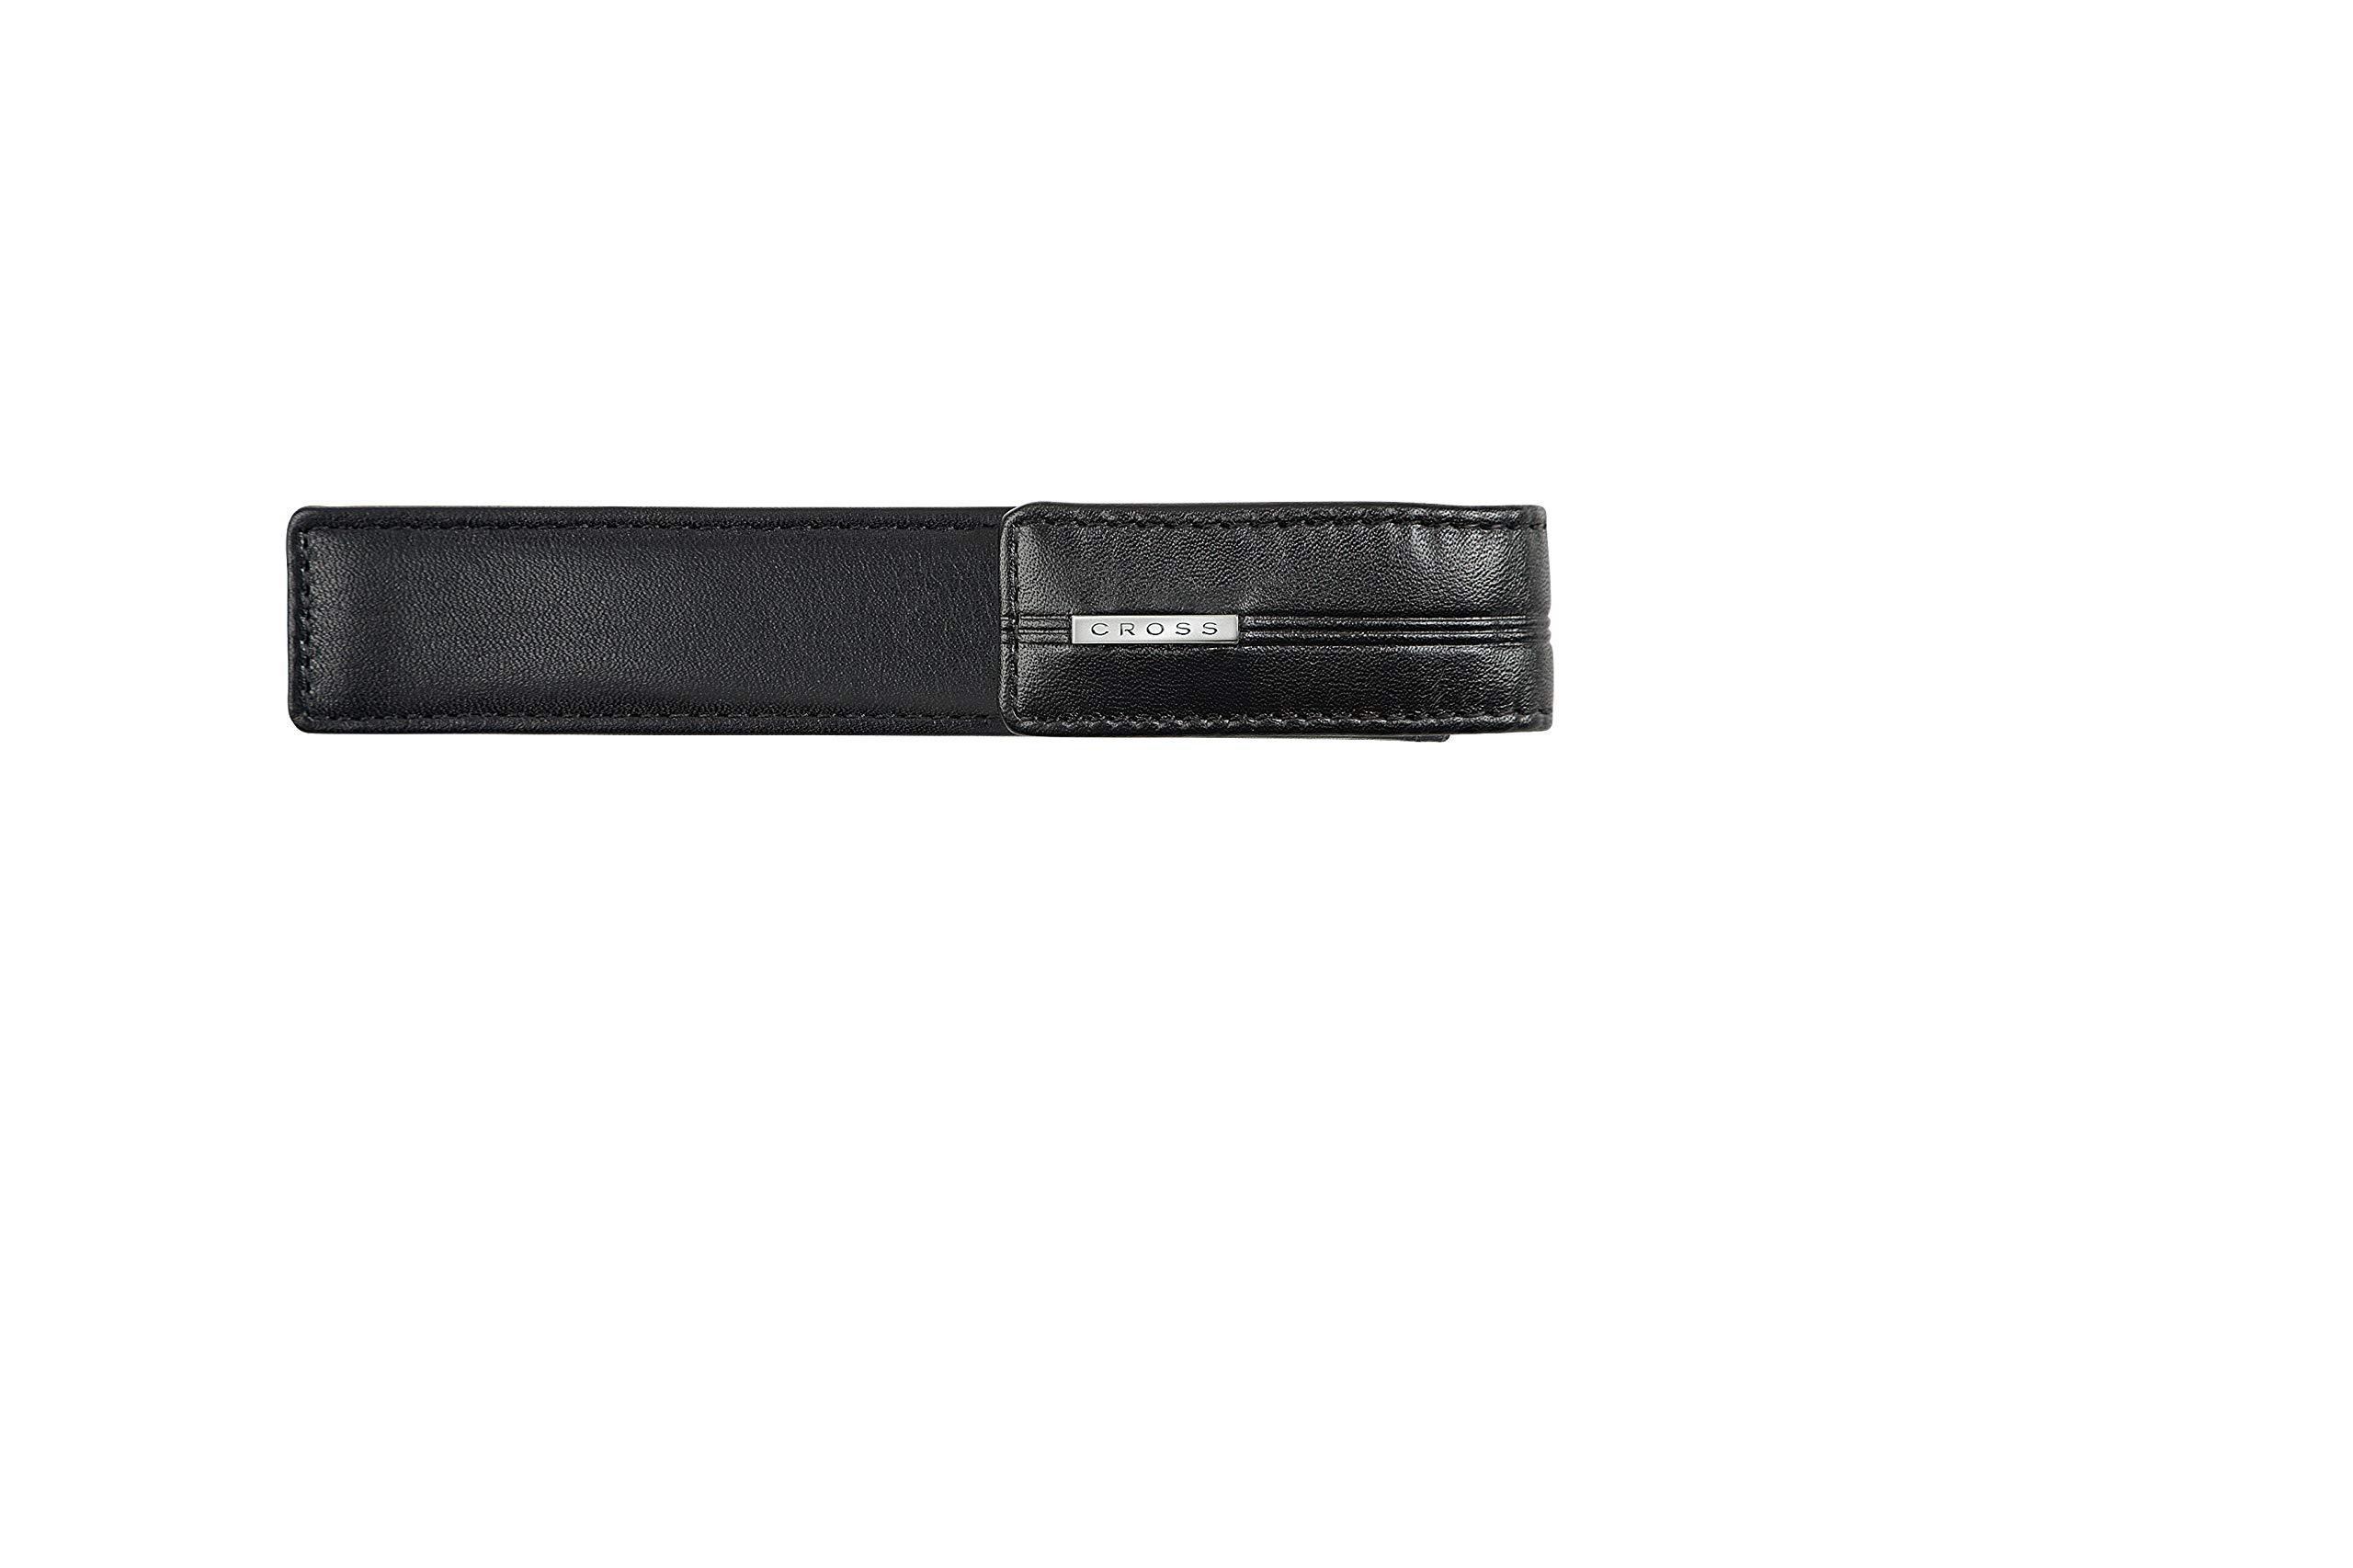 Cross Classic Century Single Pen Case Black Leather (pen not included) by Cross (Image #1)